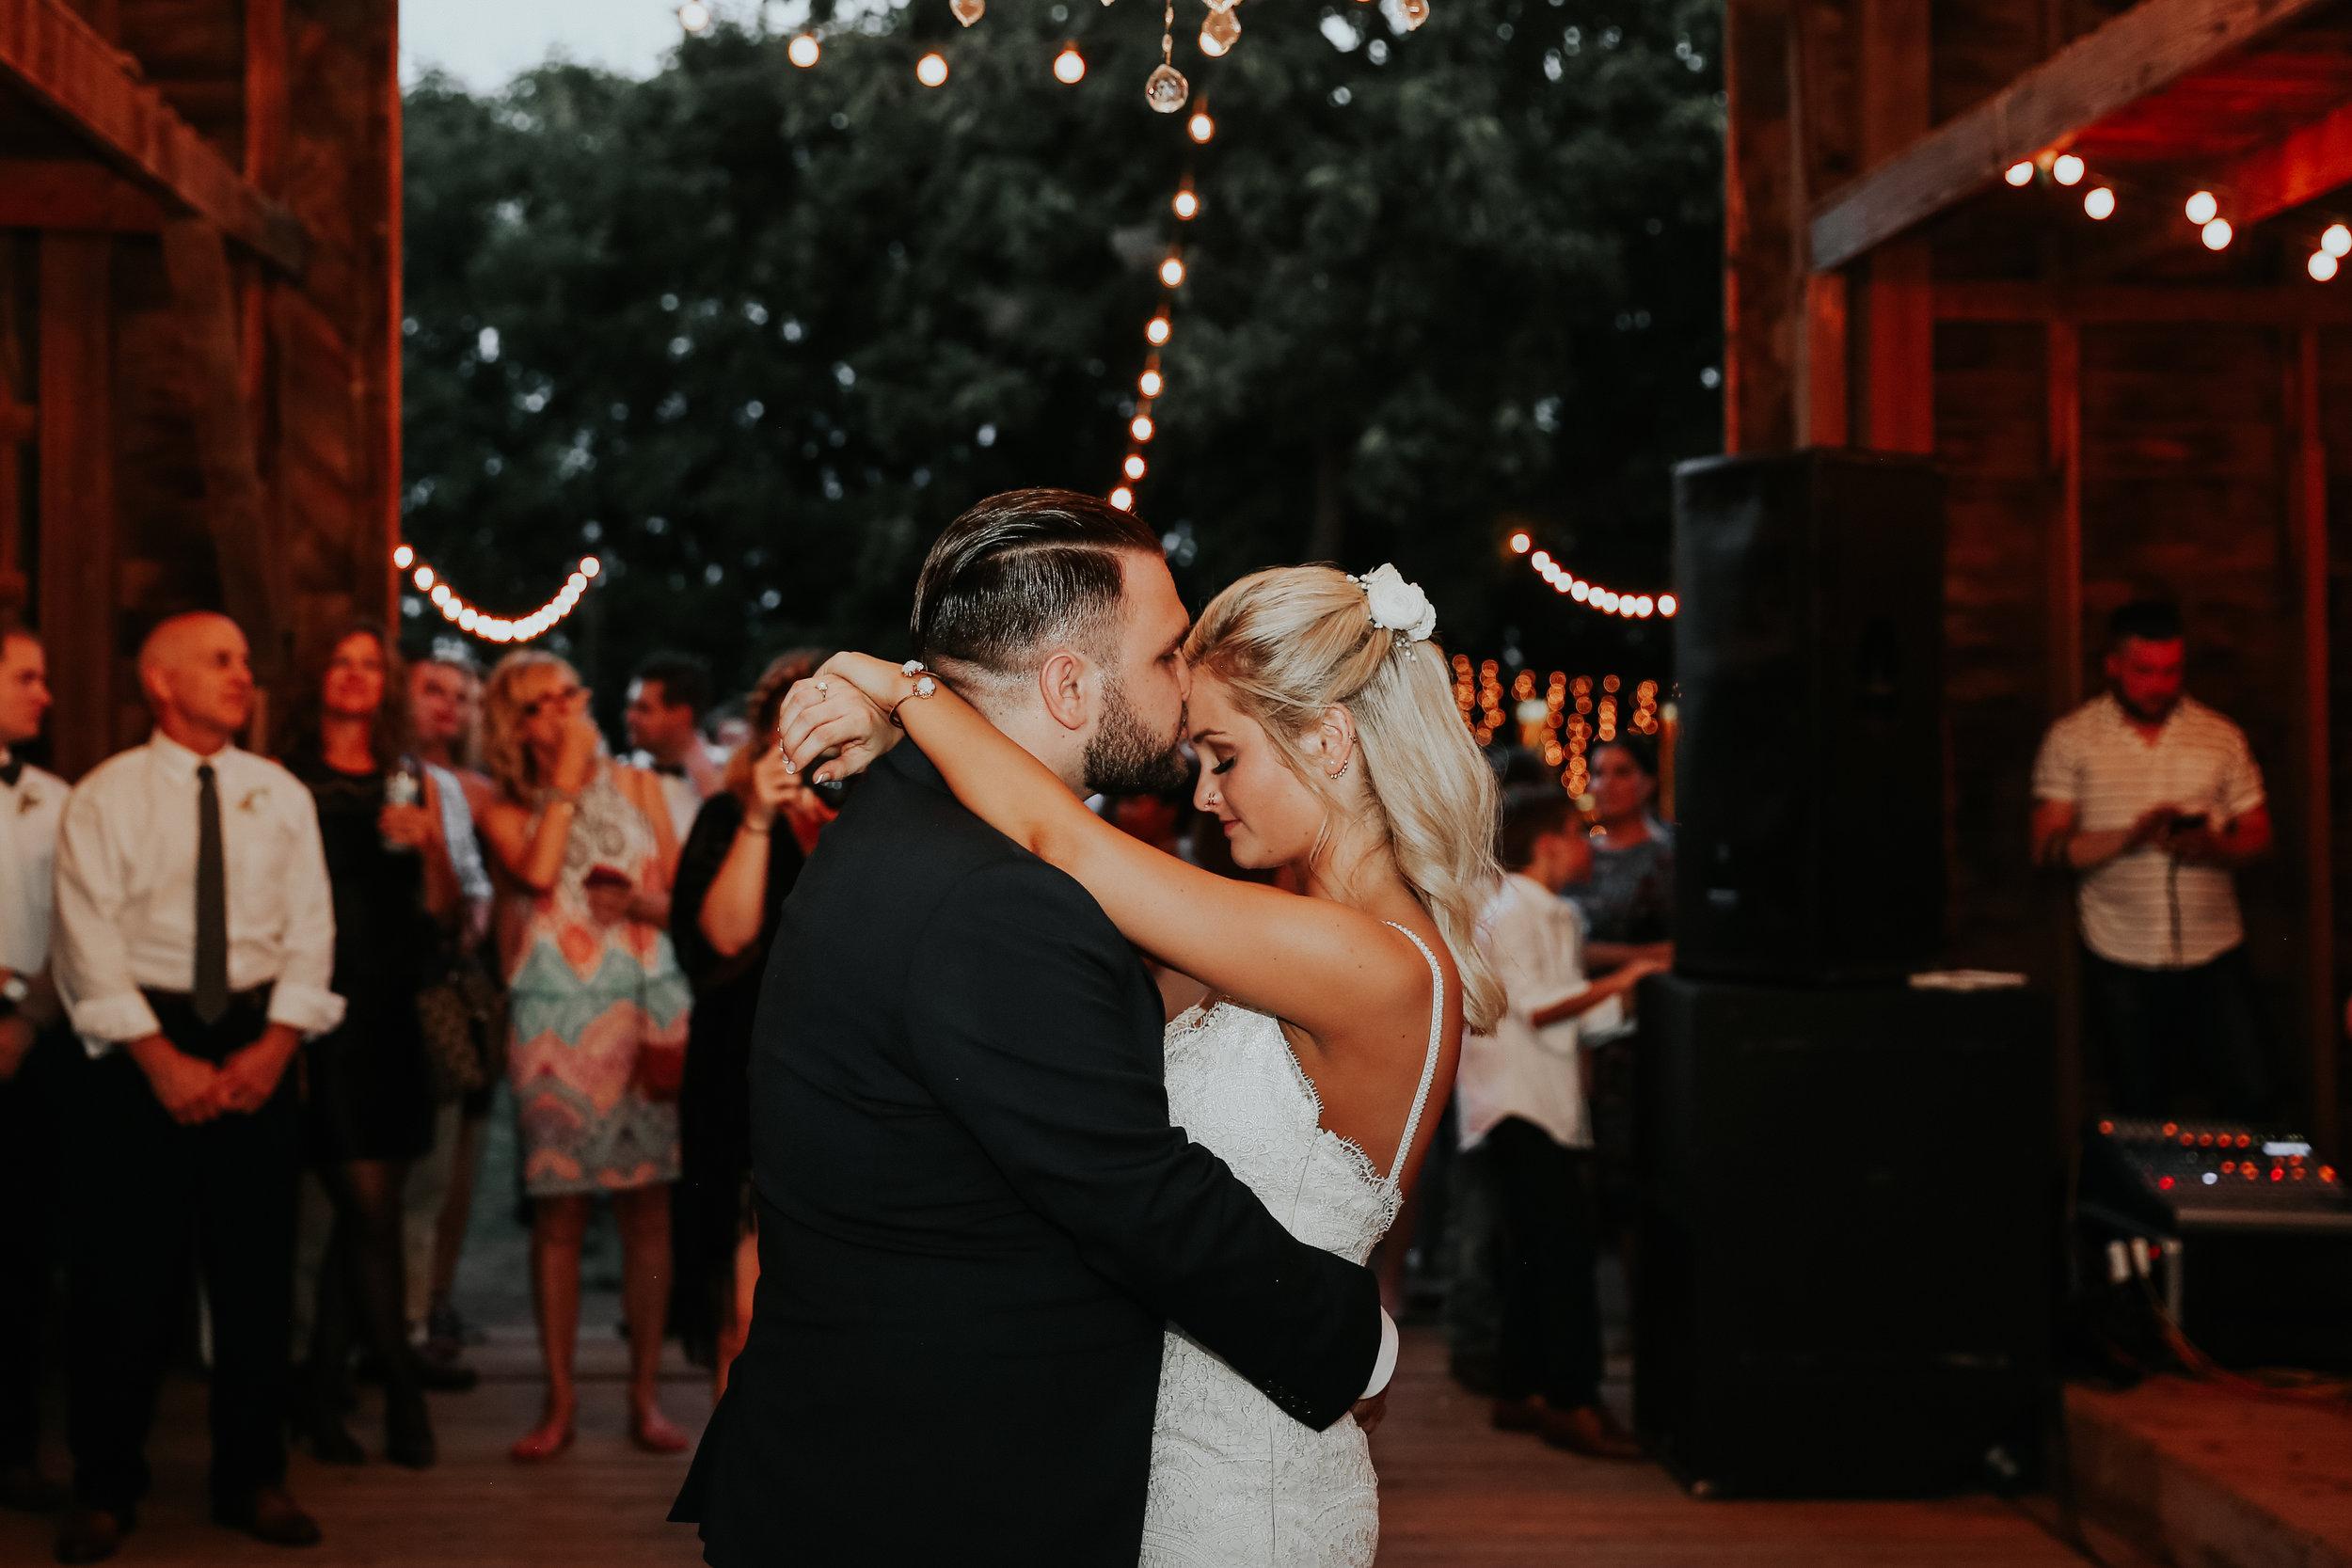 Backyard_Wedding_Oklahoma_MelissaMarshall_33.jpg